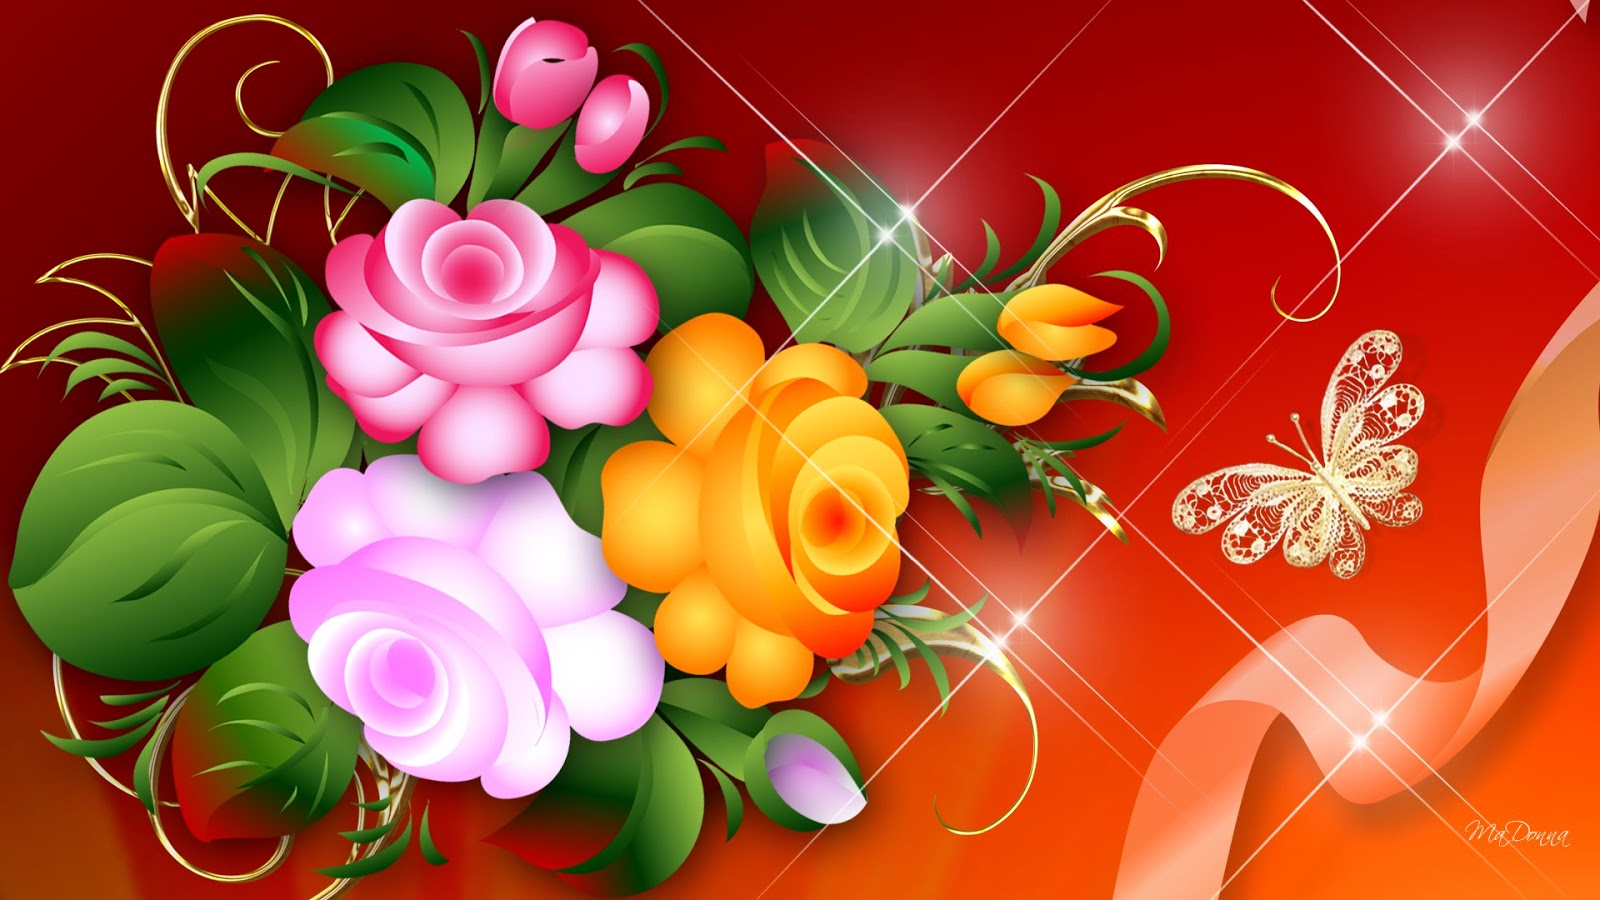 Bright Flower Wallpaper: Bright Desktop Wallpapers